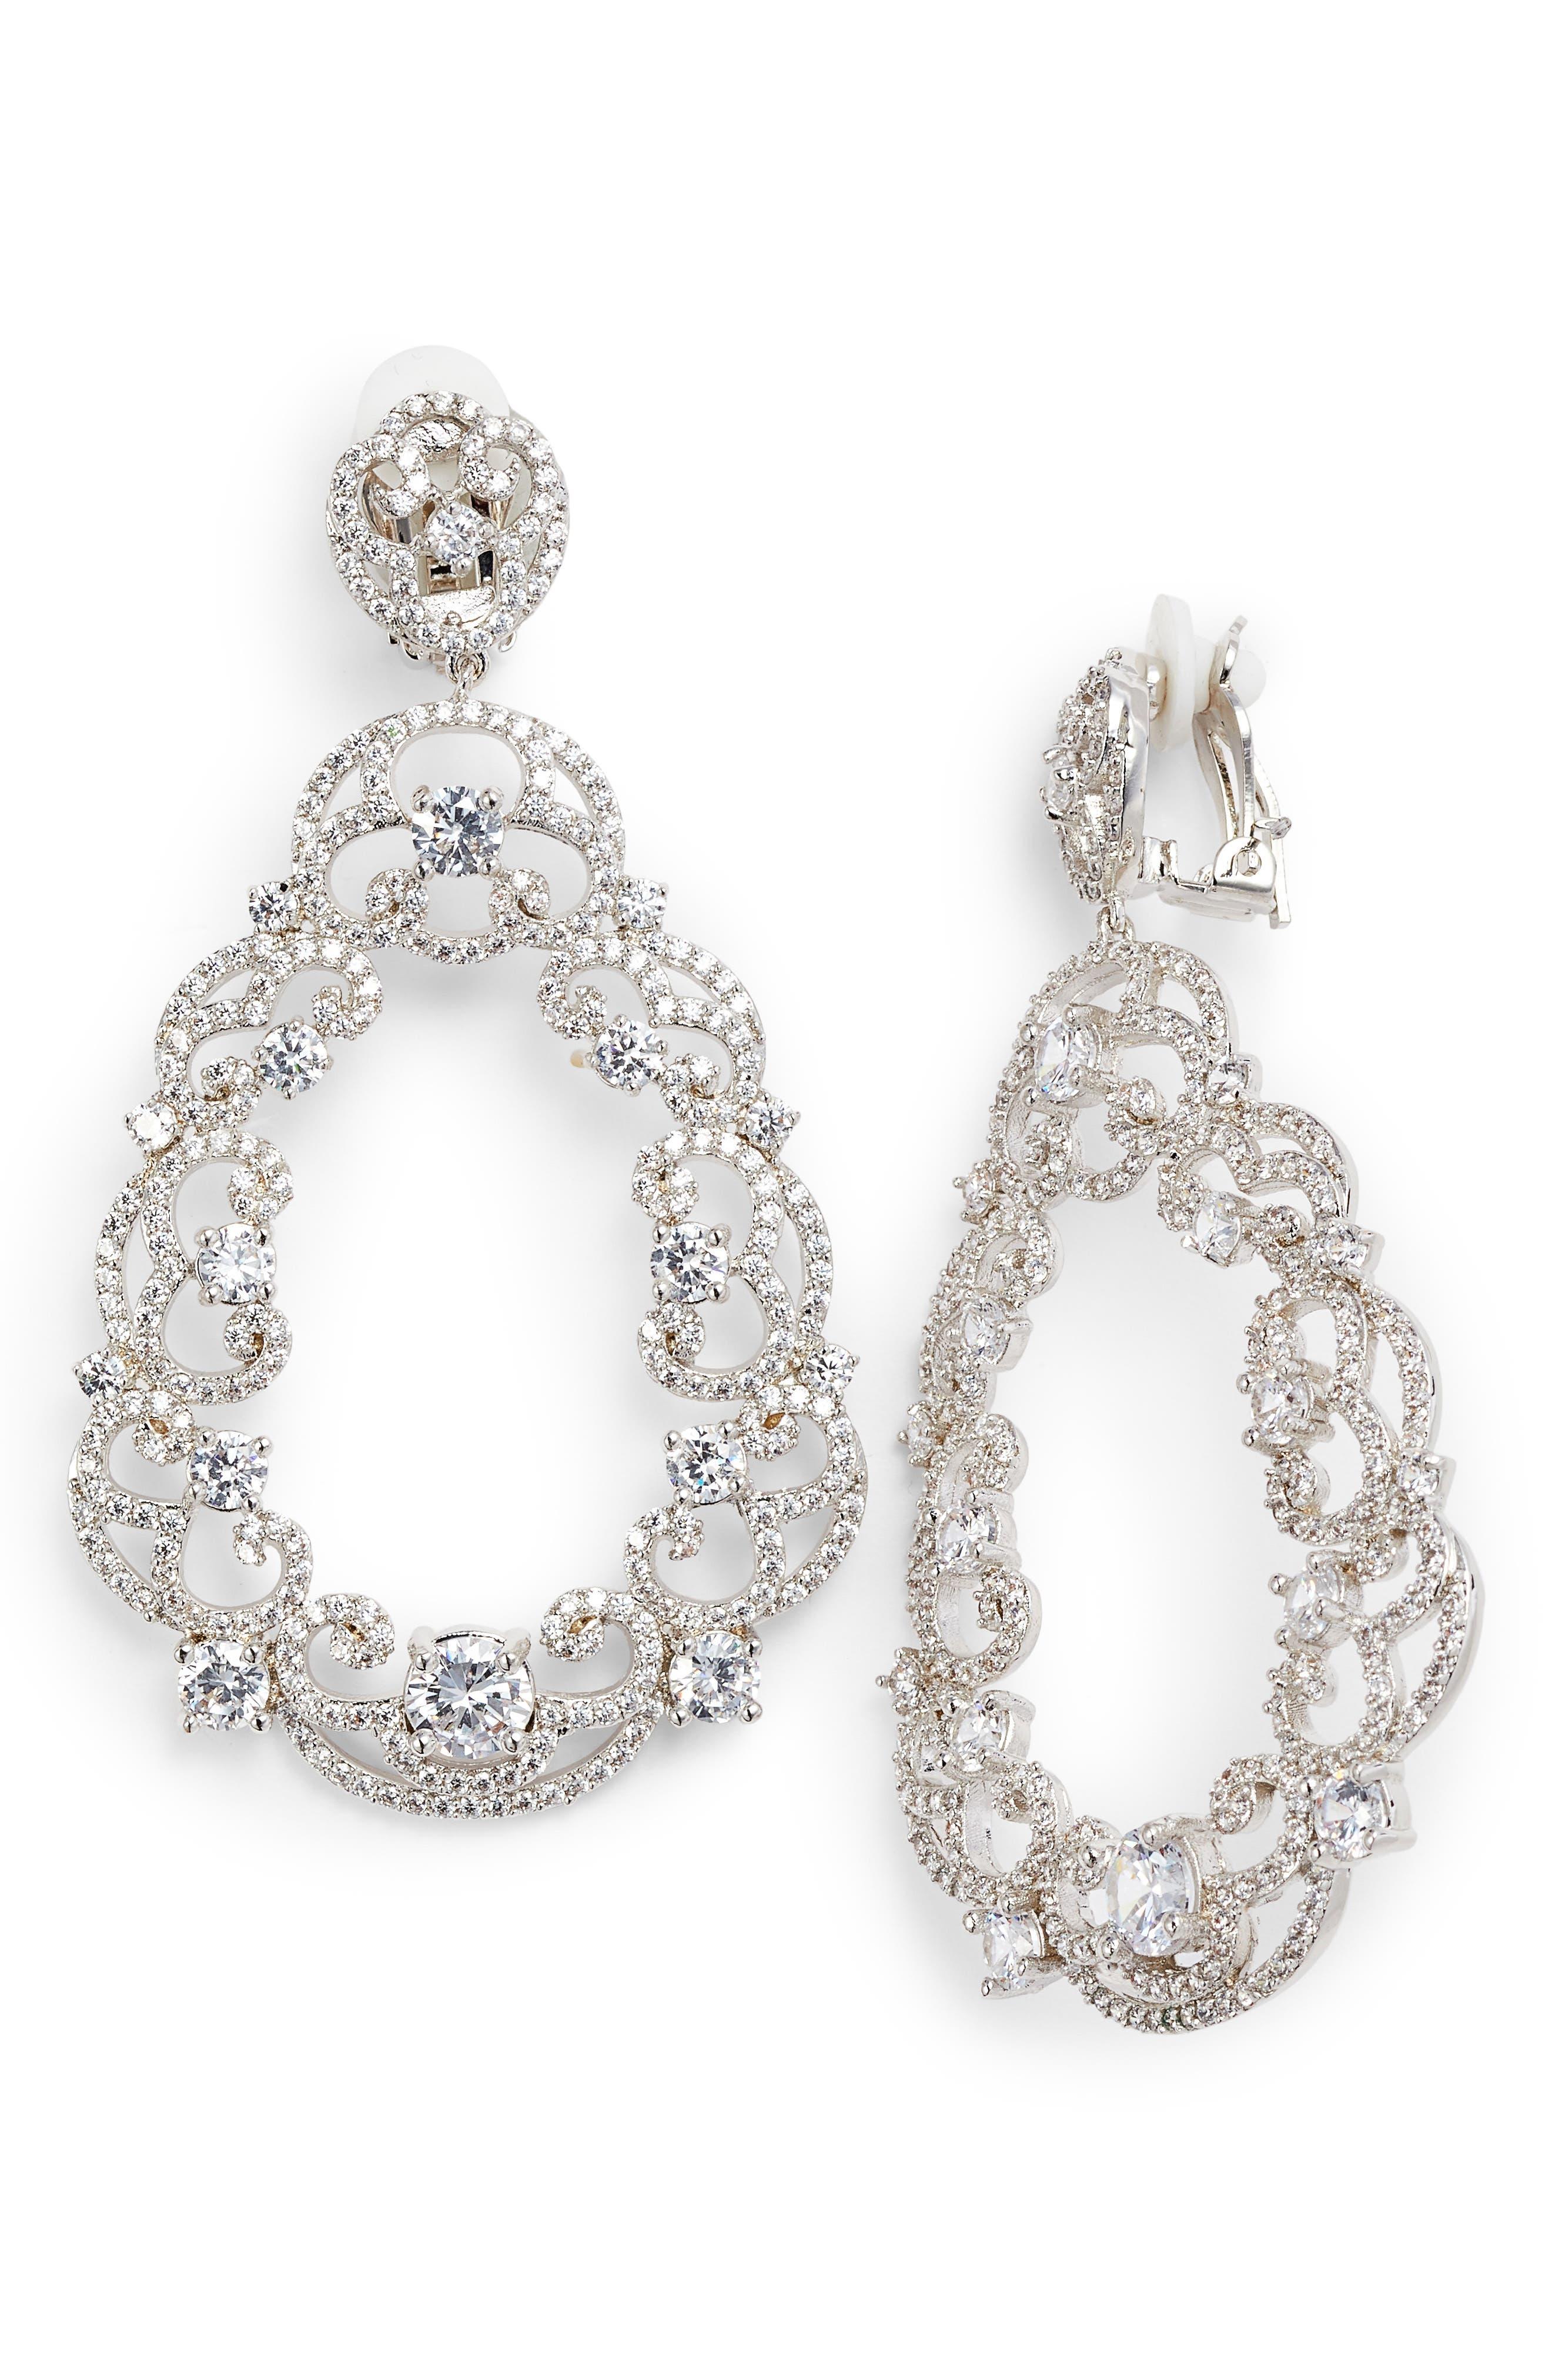 Scroll Pavé Earrings,                         Main,                         color, WHITE/ SILVER